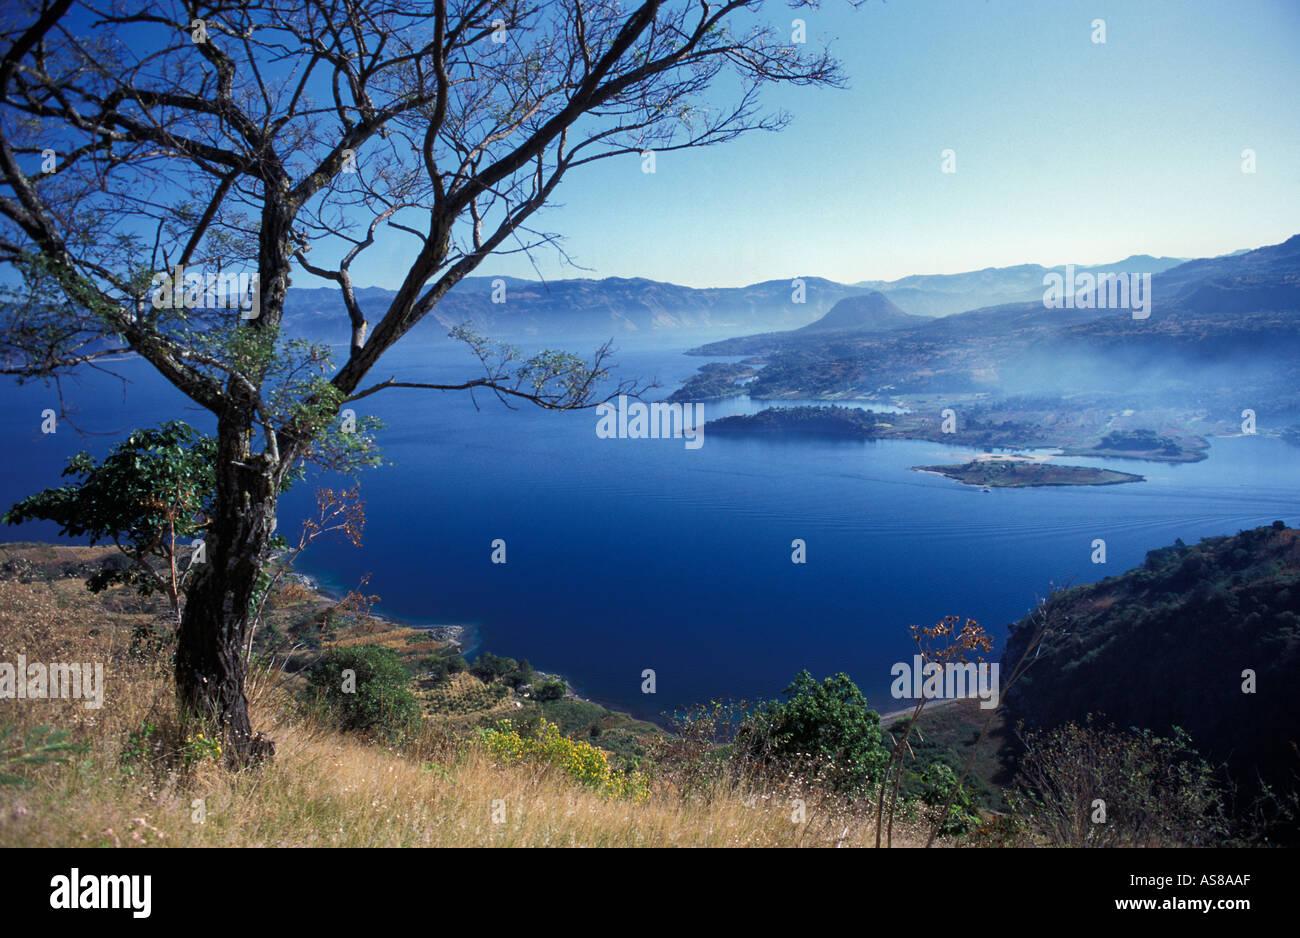 Lake Atitlan viewed from the lower slopes of San Pedro volcano at dawn Santiago Atitlan below Guatemala - Stock Image